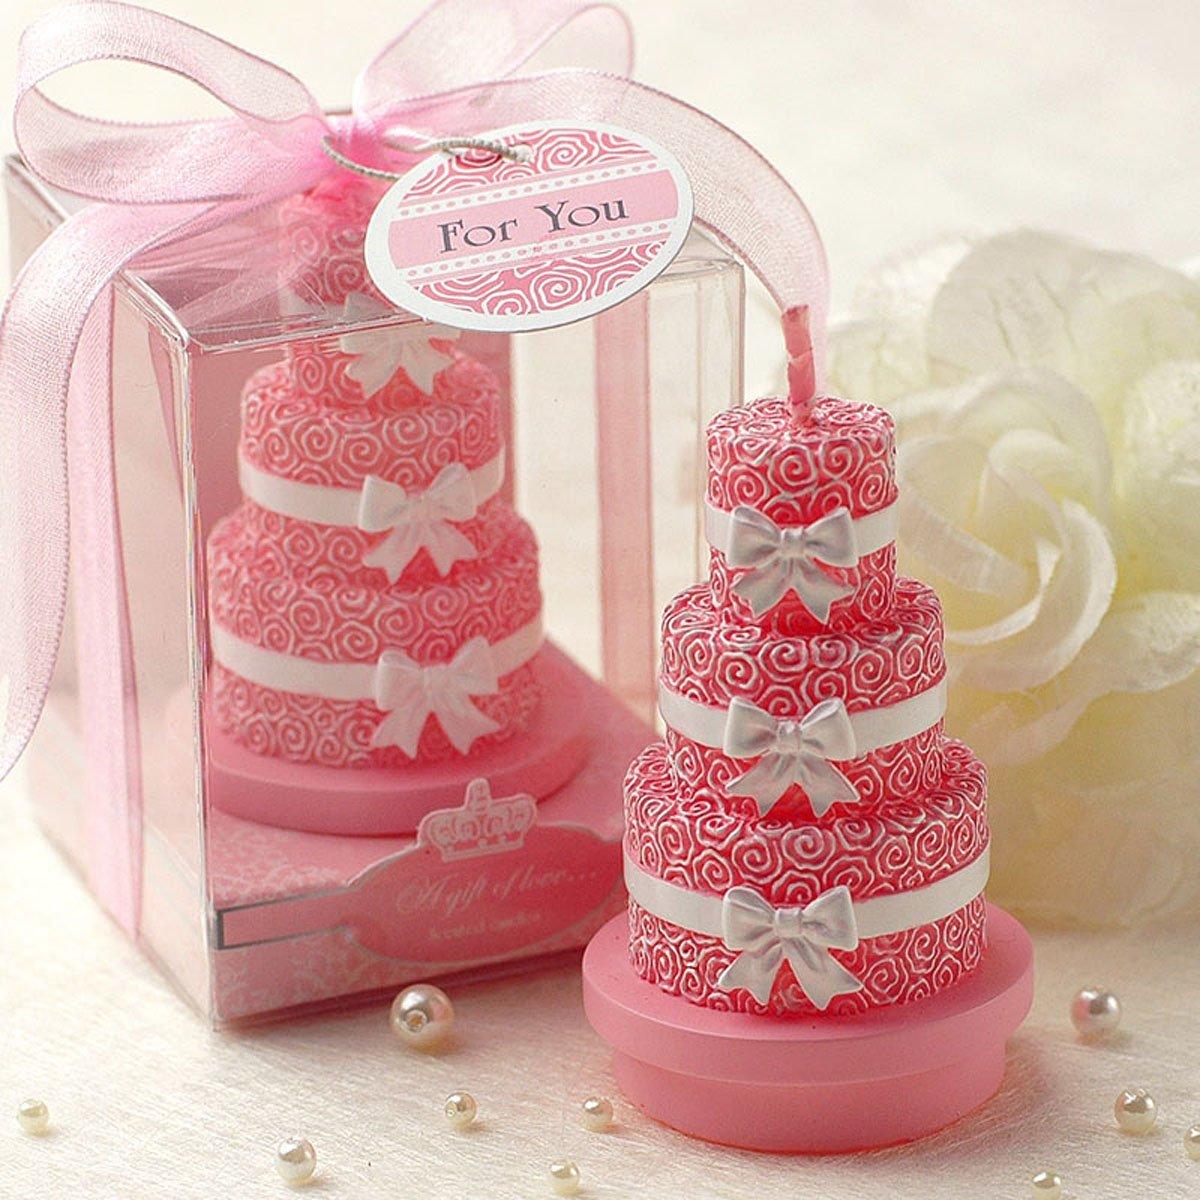 Cartoon Romantic Birthday Cake Charming Gifts Party Candles Smokeless Candles Birthday Candles for Baby Shower and Wedding Favor Keepsake Favor (10)